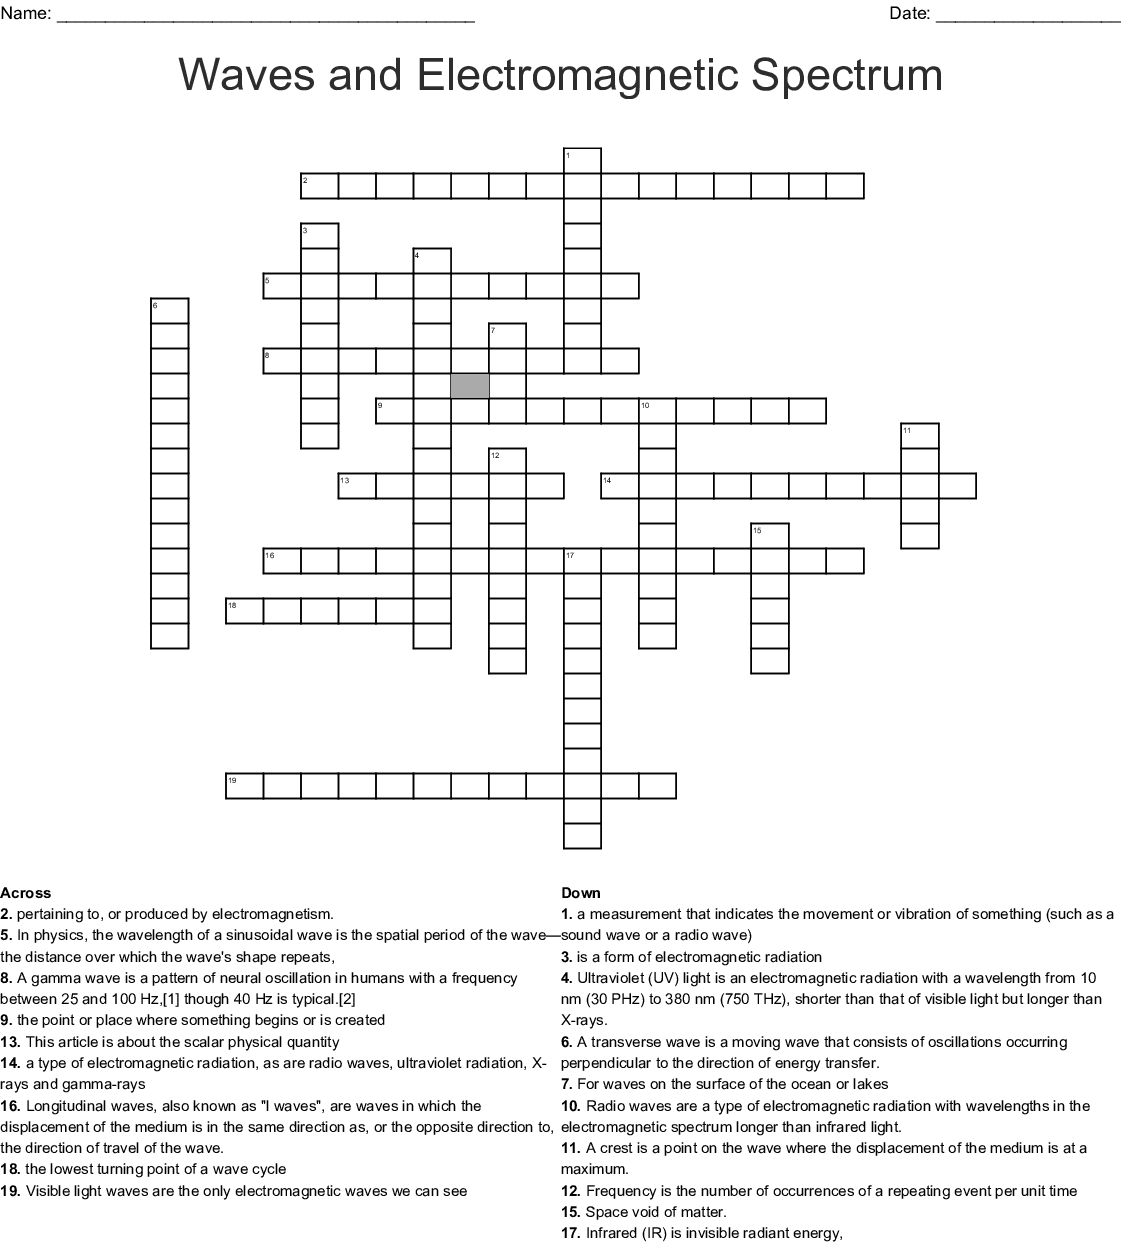 Electromagnetic Spectrum Crossword